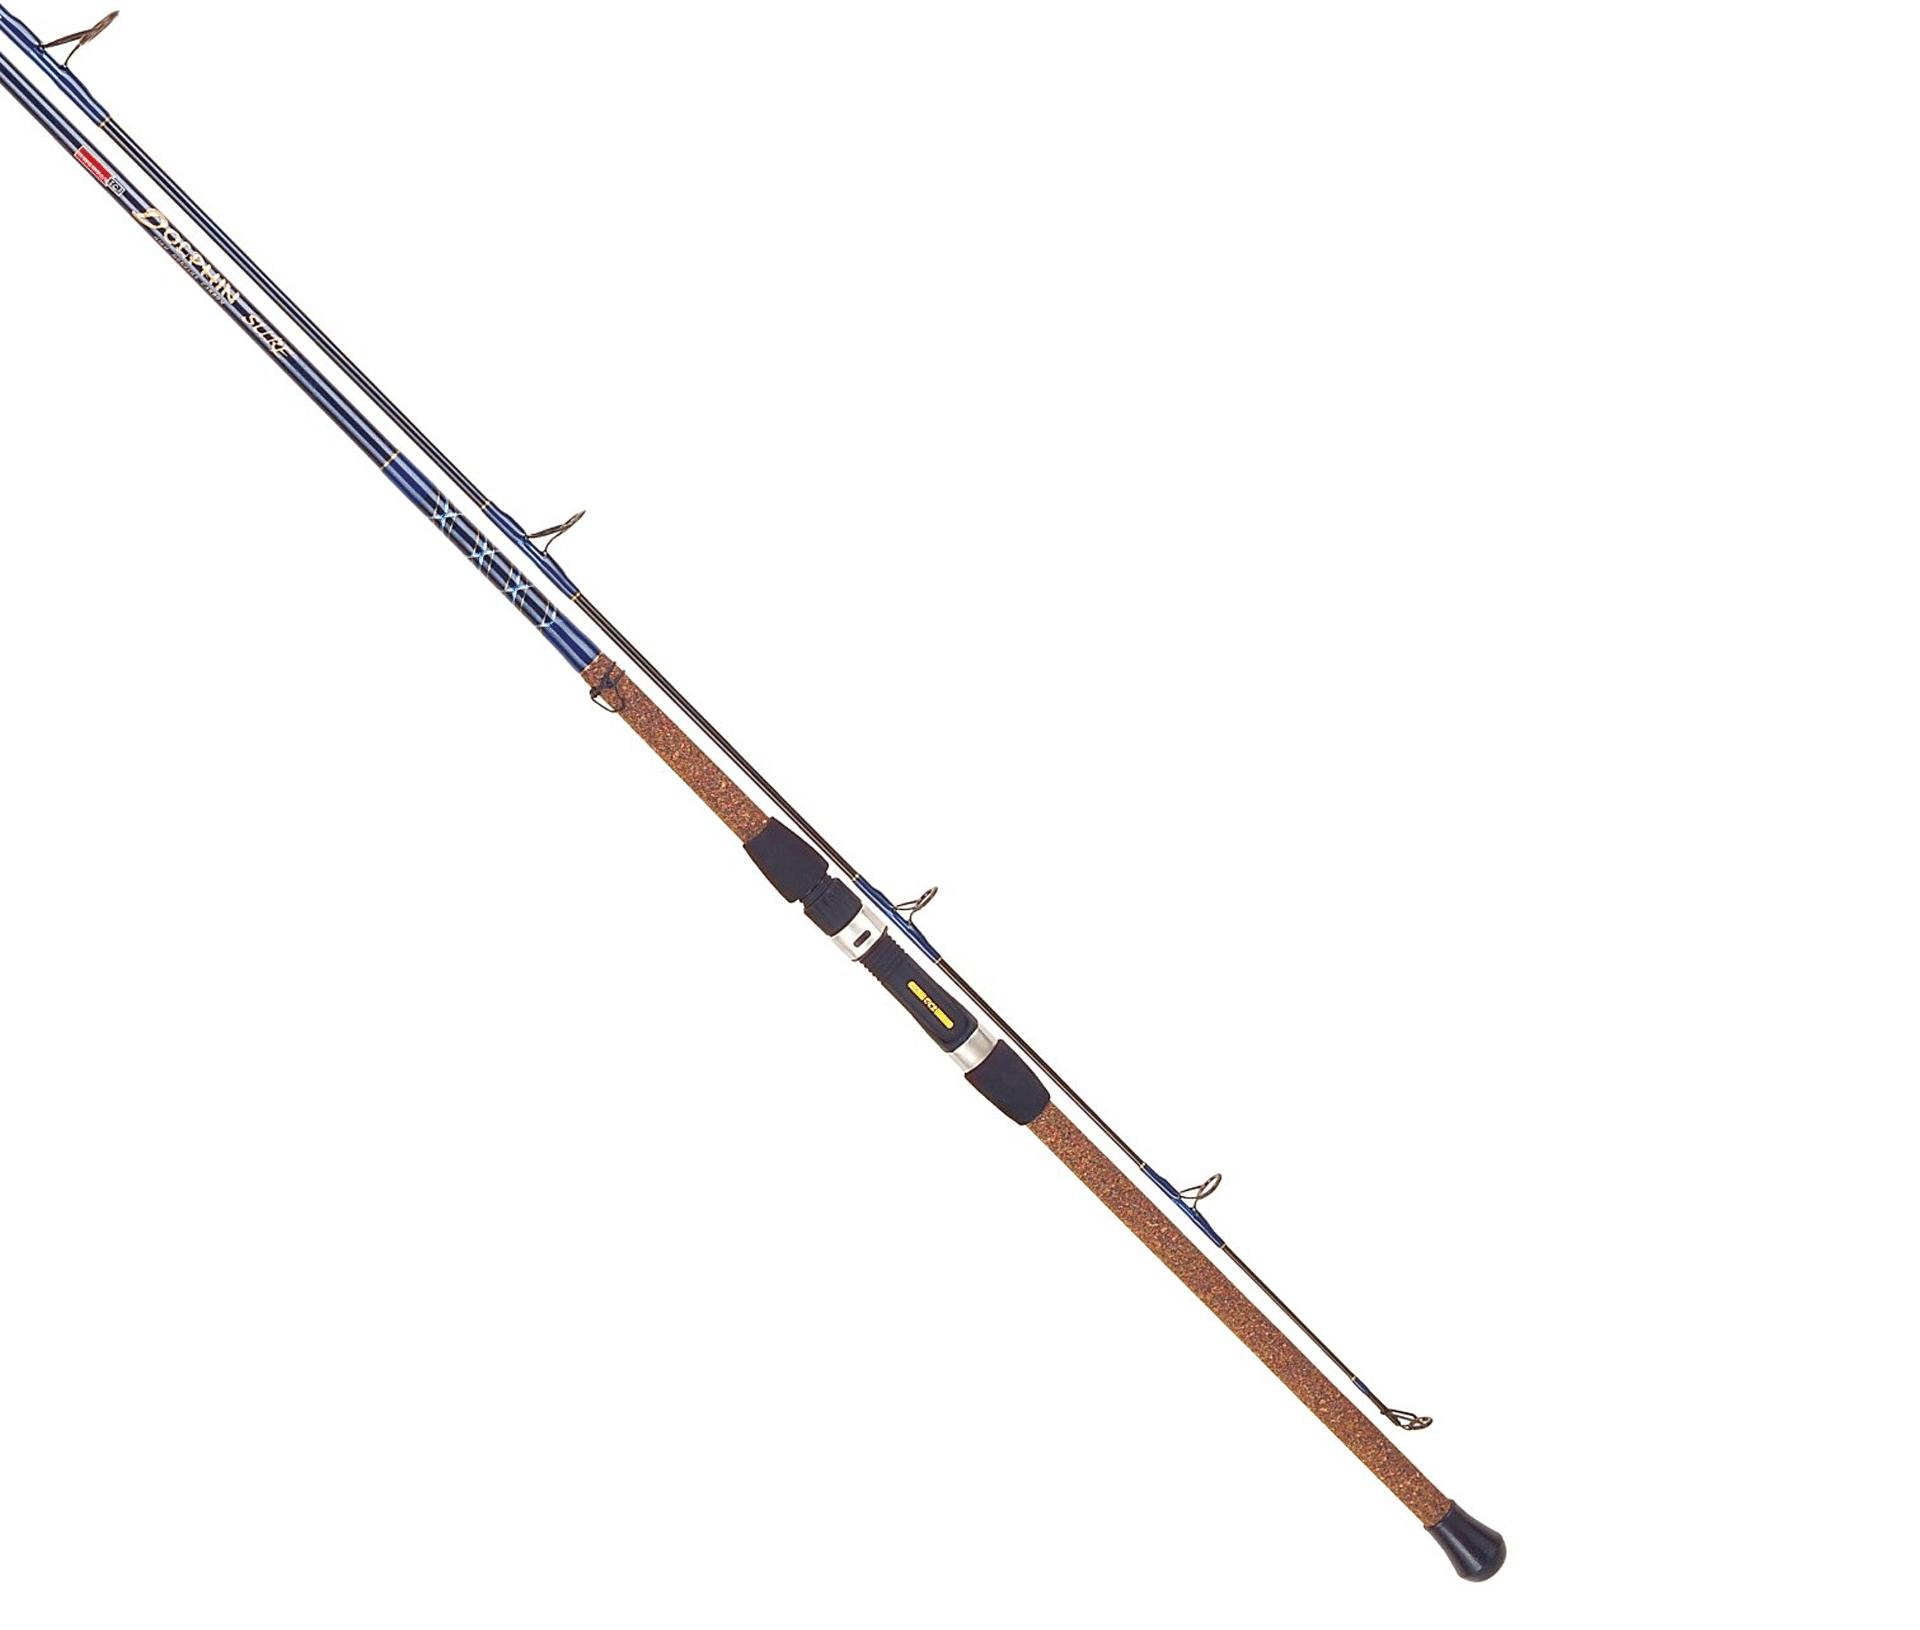 Tica UGSA Series Surf Spinning Fishing Rod